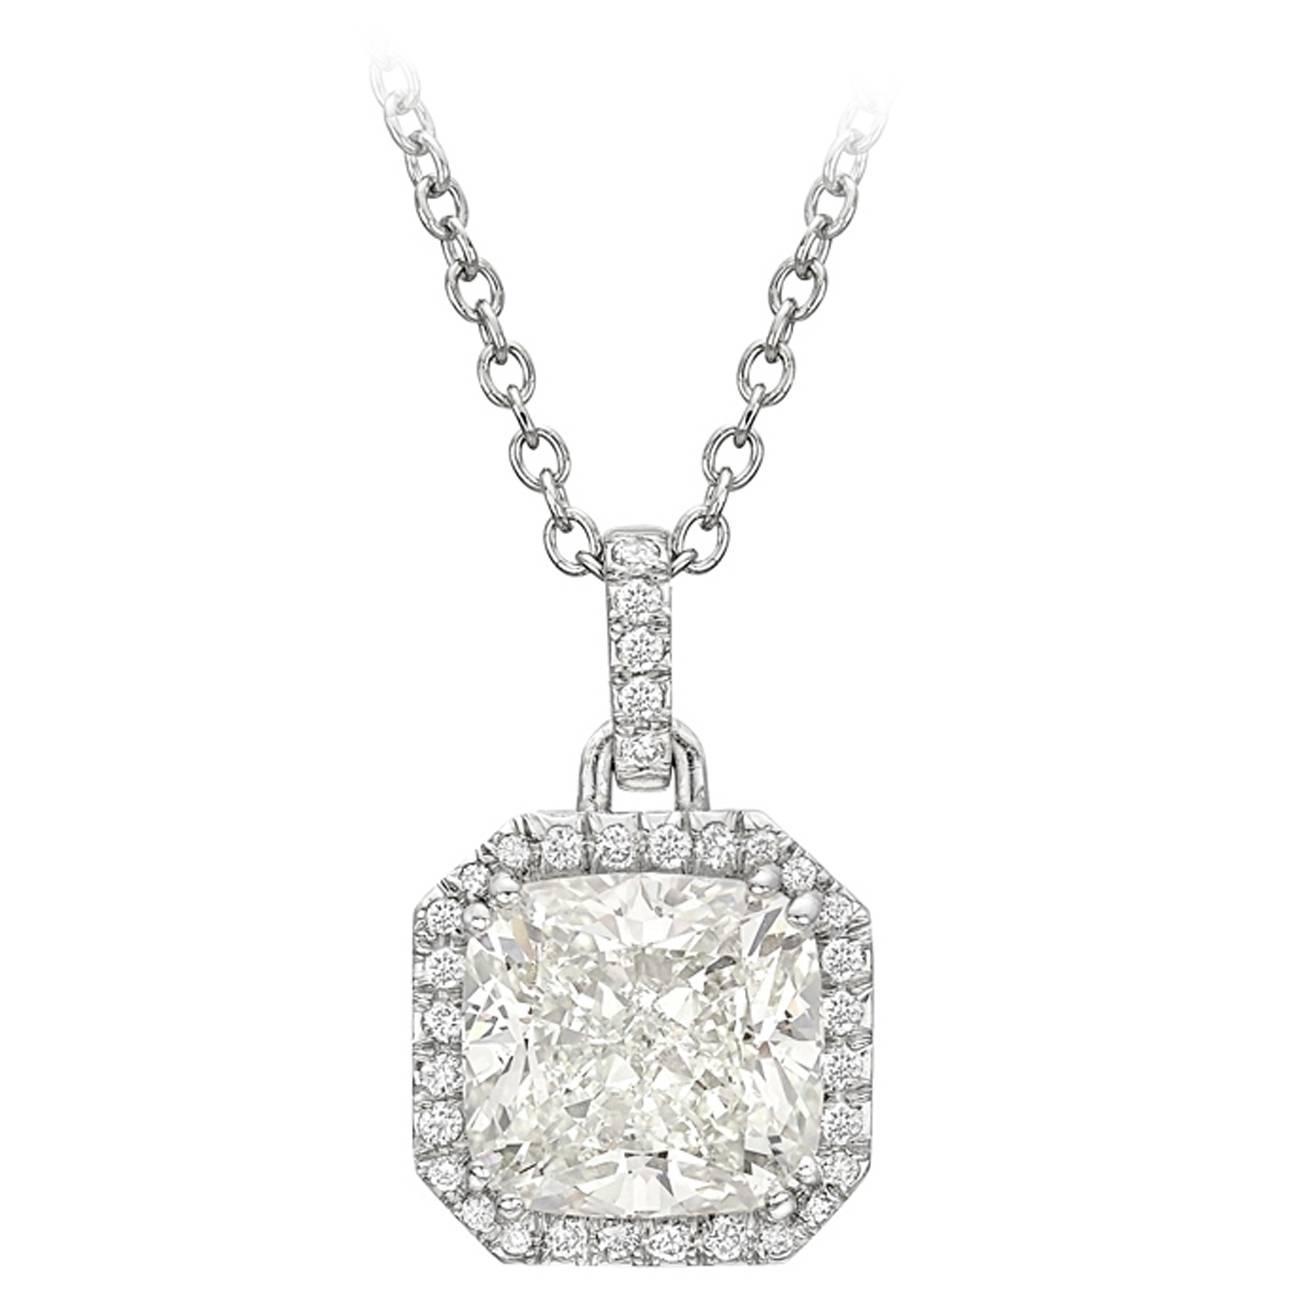 Betteridge 5.08 Carat Cushion-Cut Diamond Pendant at 1stdibs